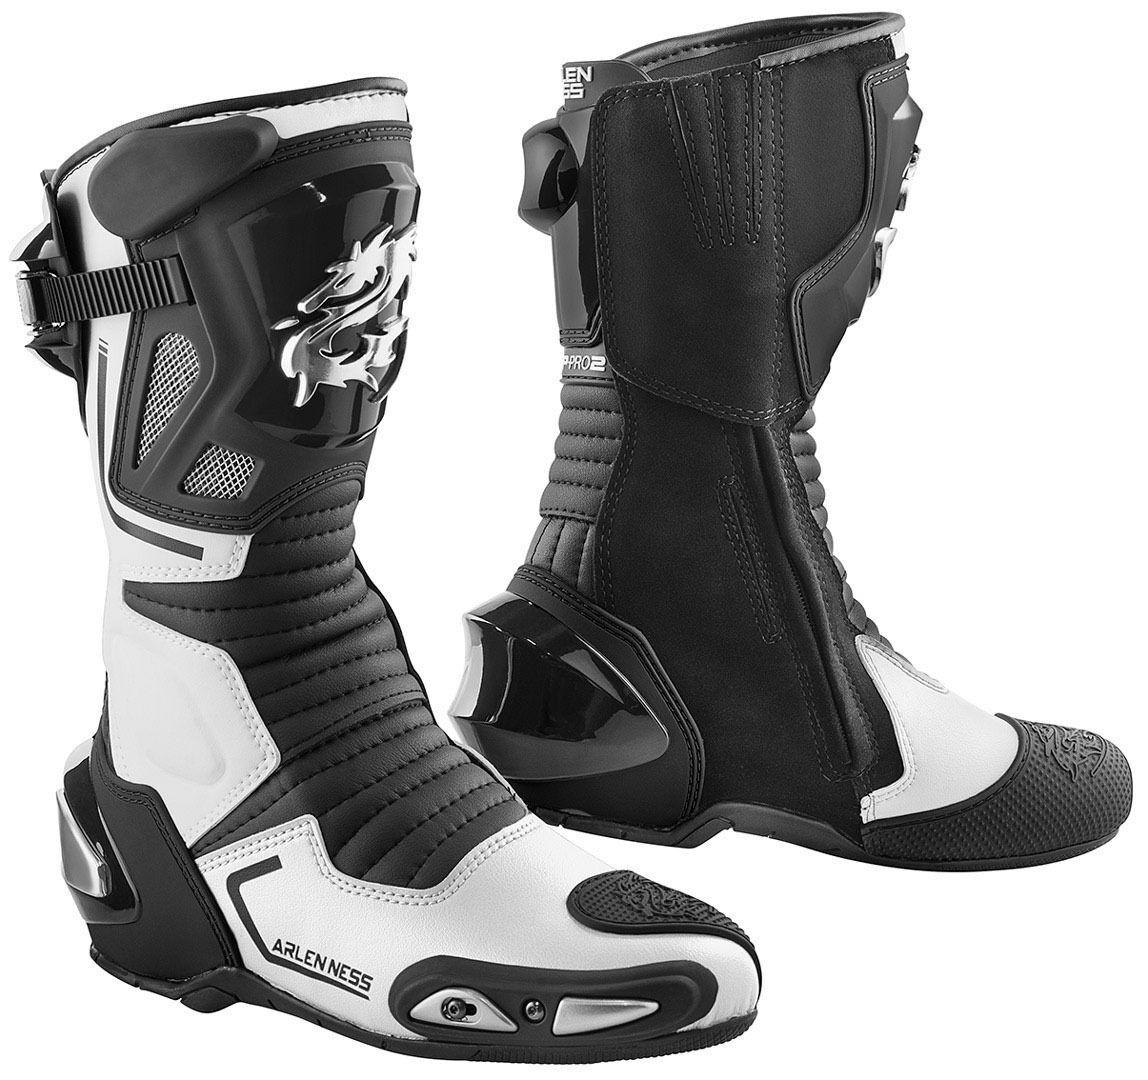 Arlen Ness Sugello Bottes de moto Noir Blanc taille : 45